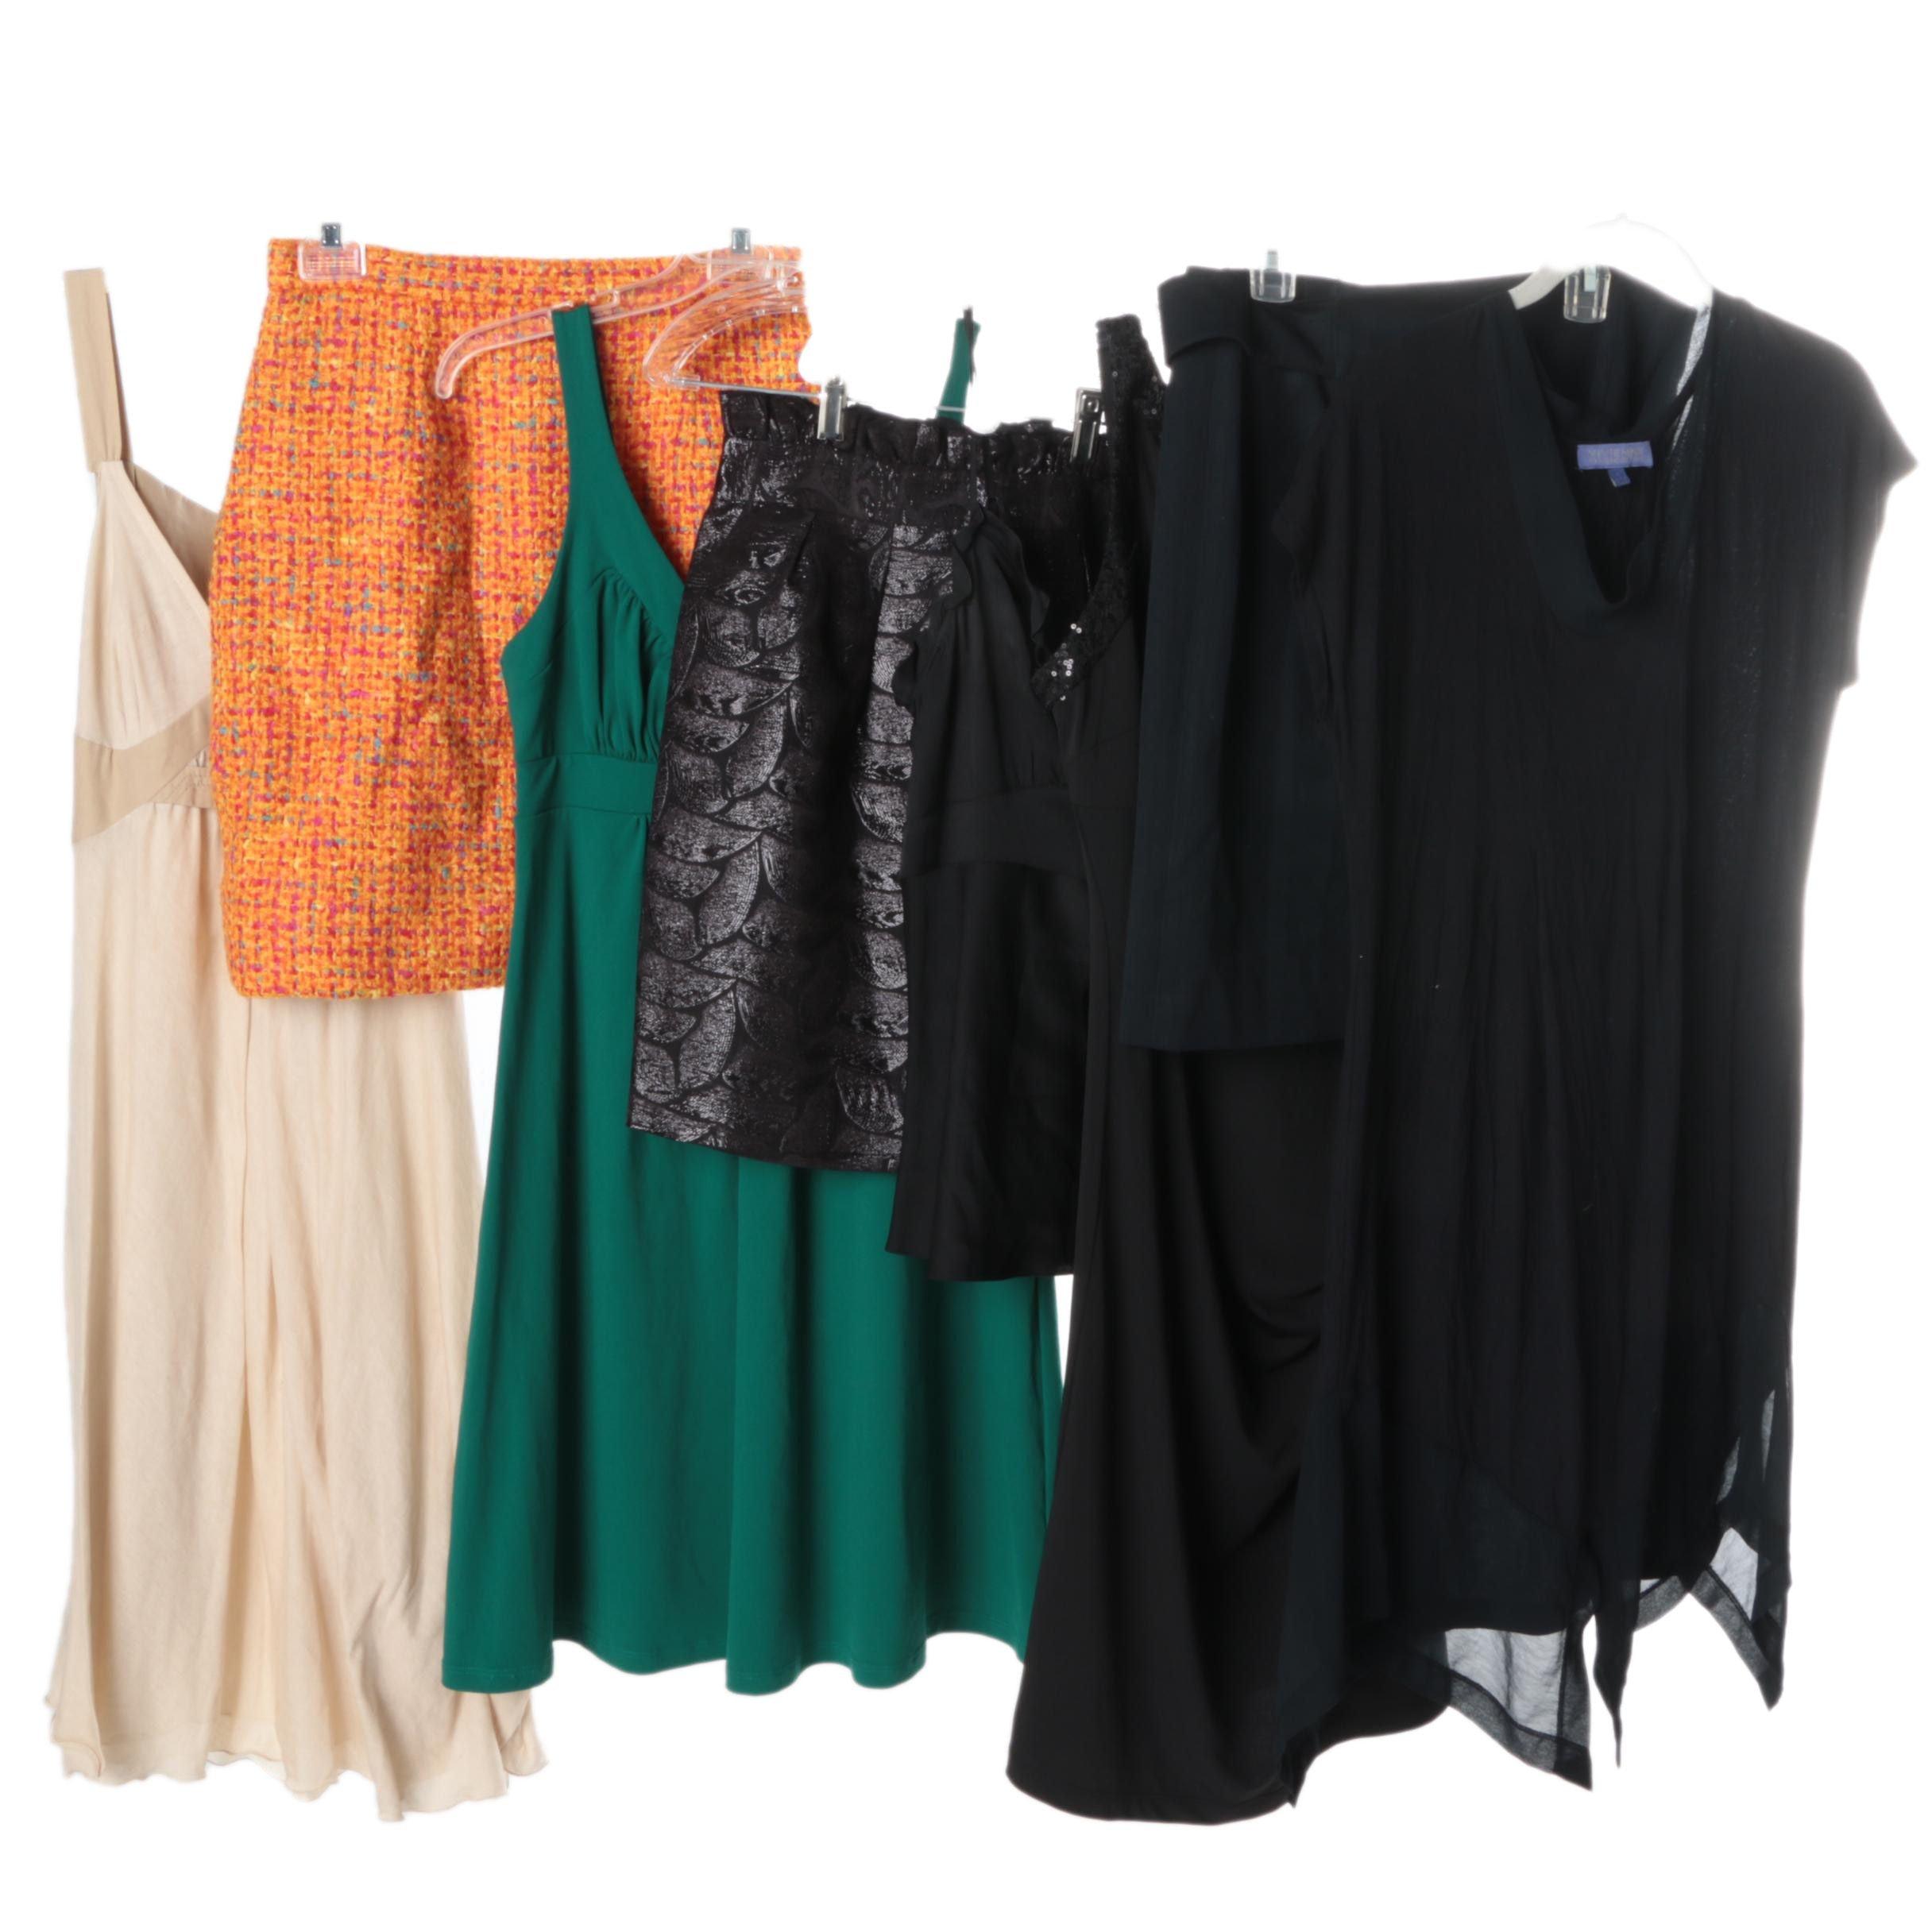 Women's Dresses, Skirts and Blouses Including Philosophy di Alberta Ferretti